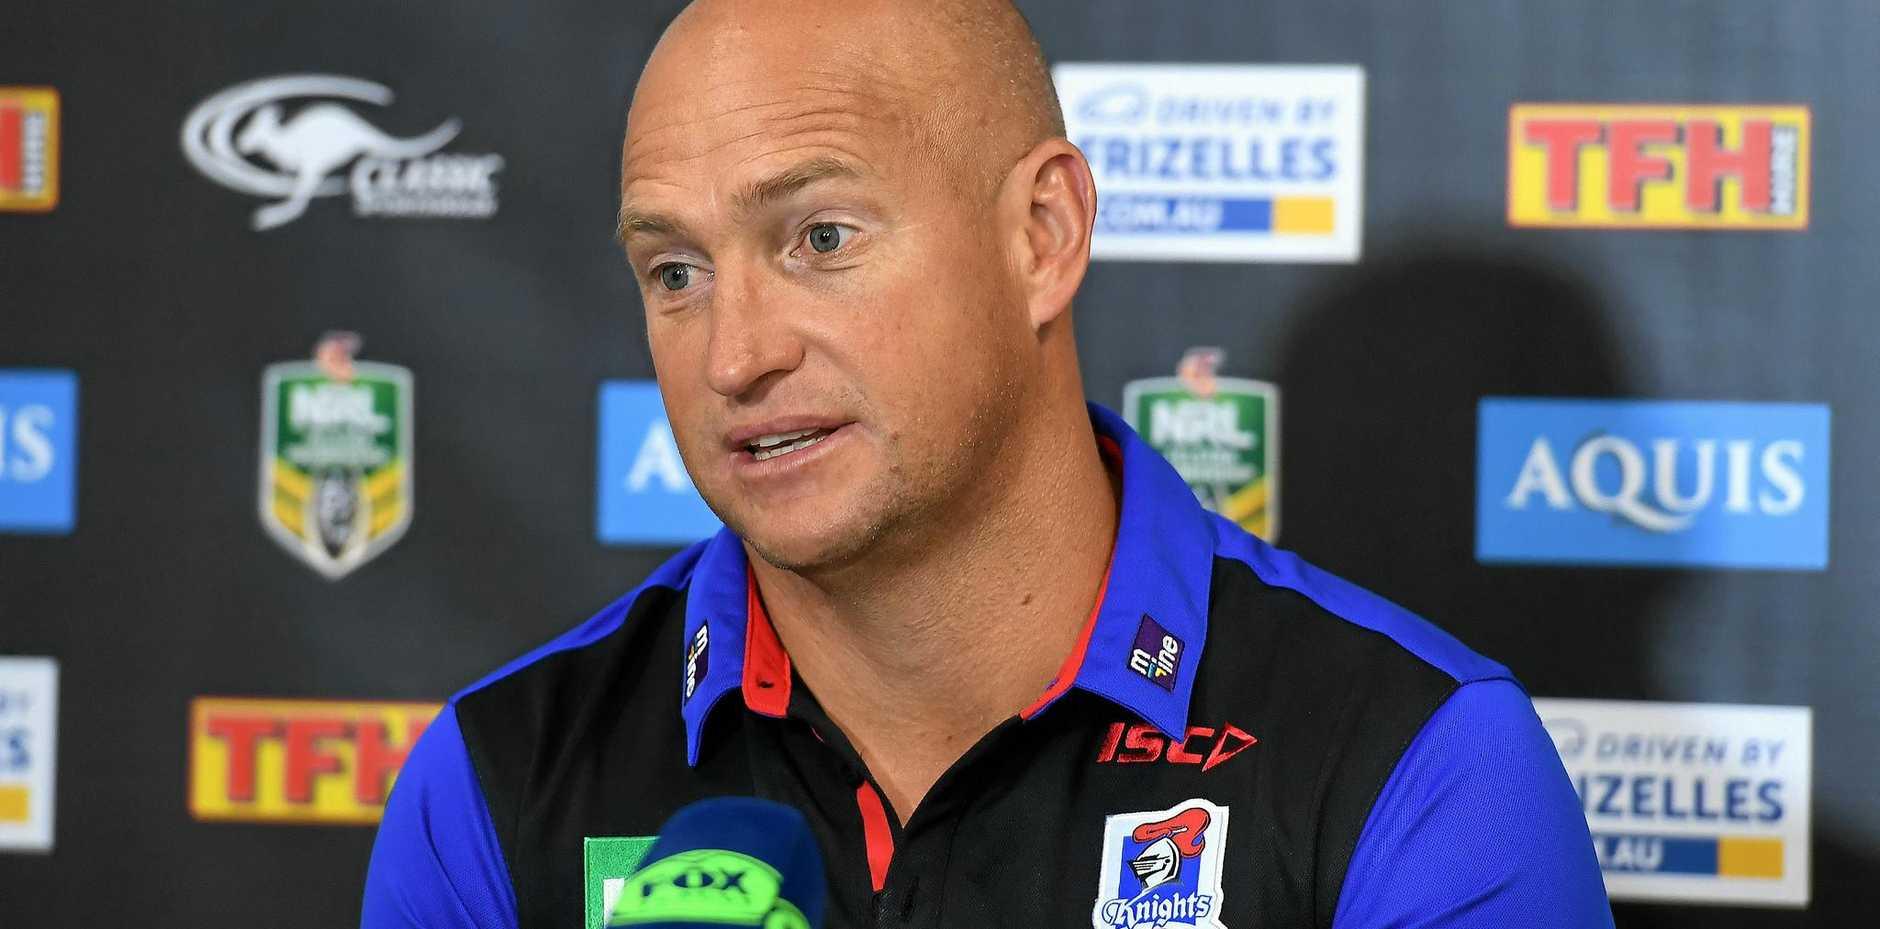 Knights coach Nathan Brown at a press conference.